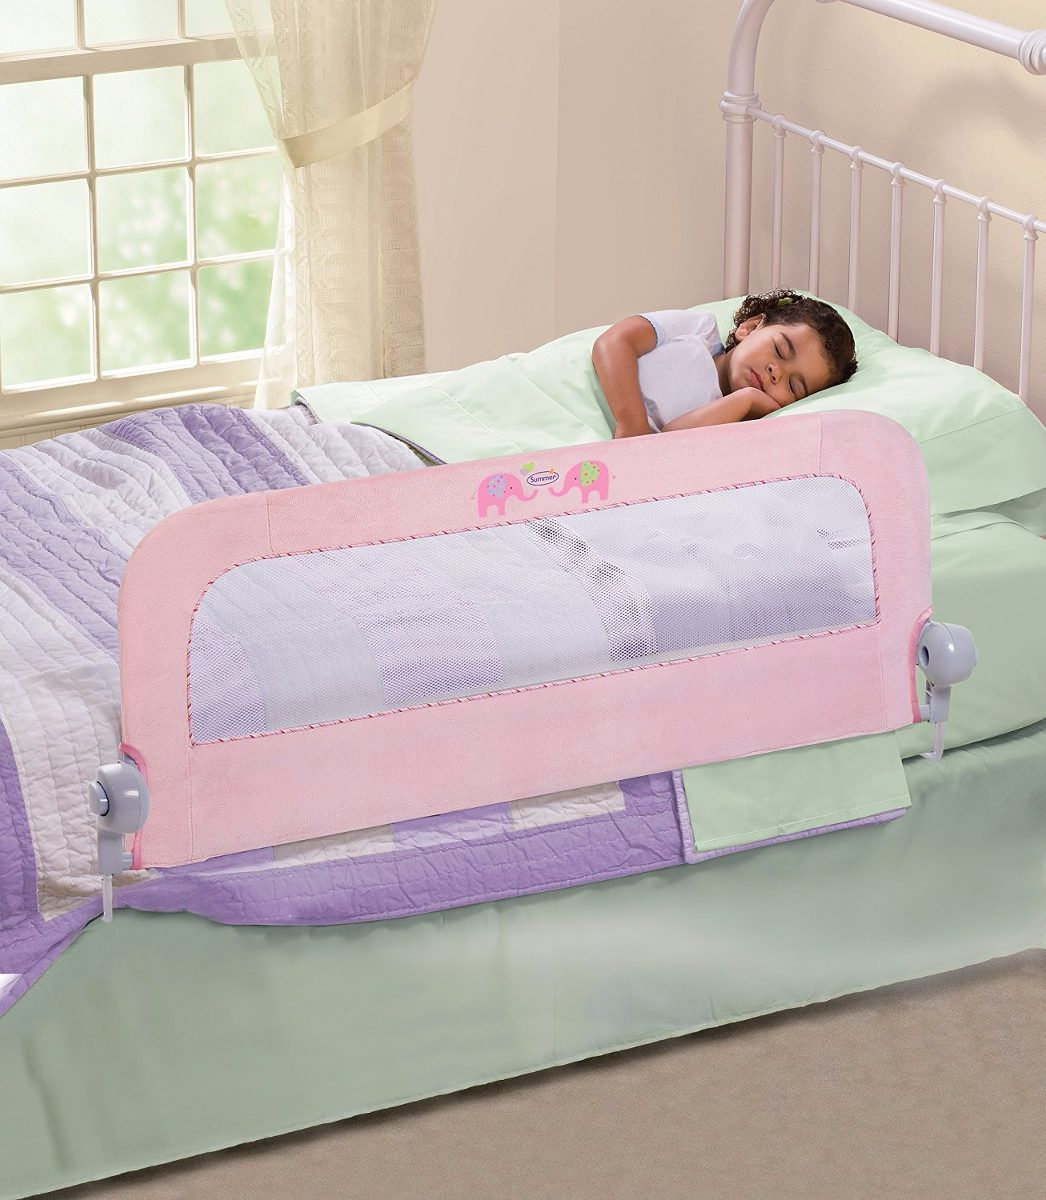 Barandilla barandal de seguridad cama plegable para ni a for Cama que se dobla